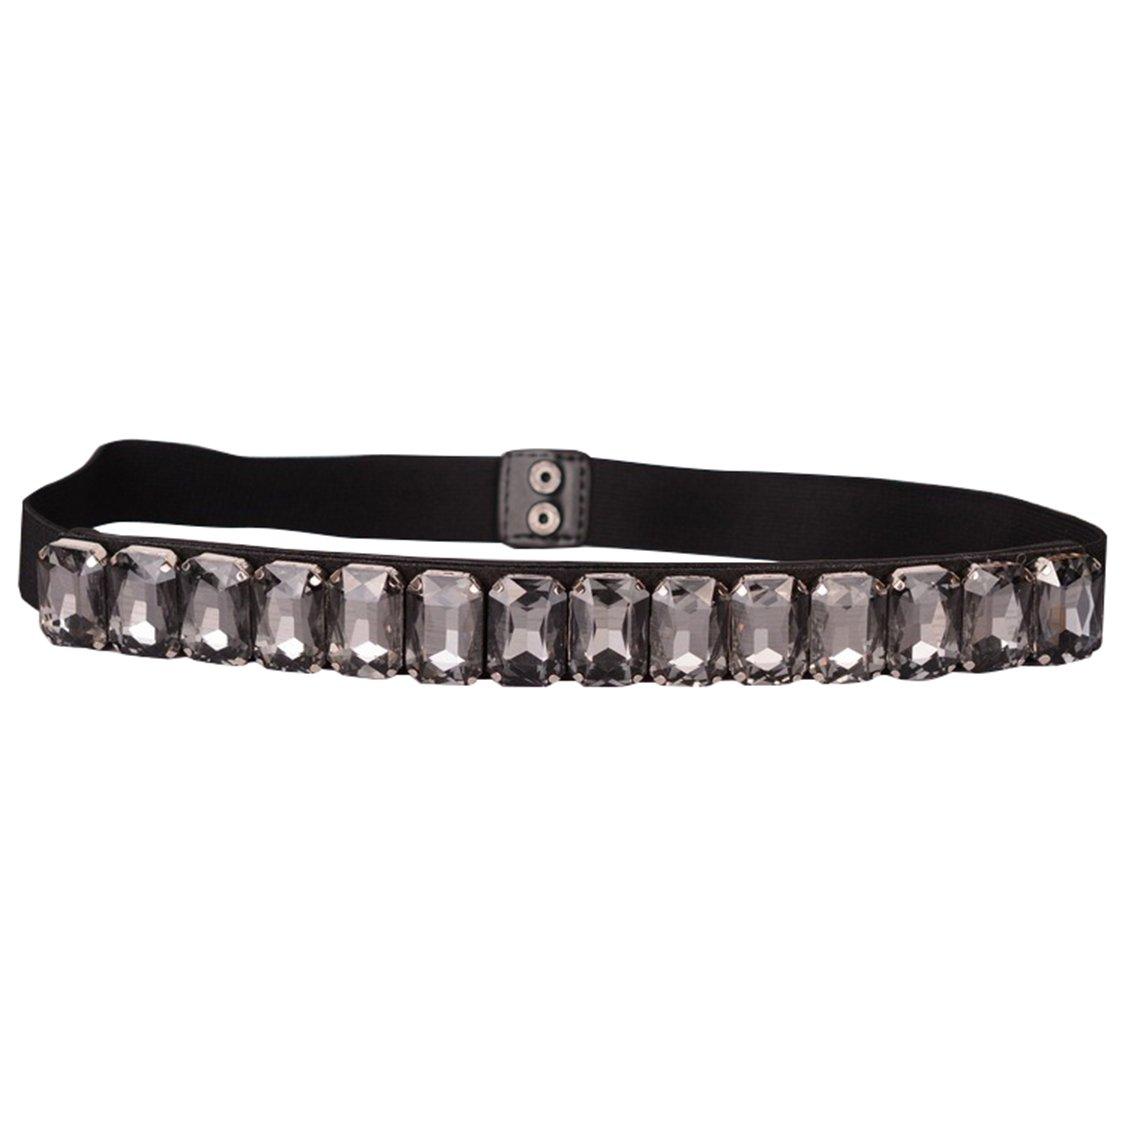 SanJL Women's Elastic Waist Belt with Rhinestone for Dress (Black)